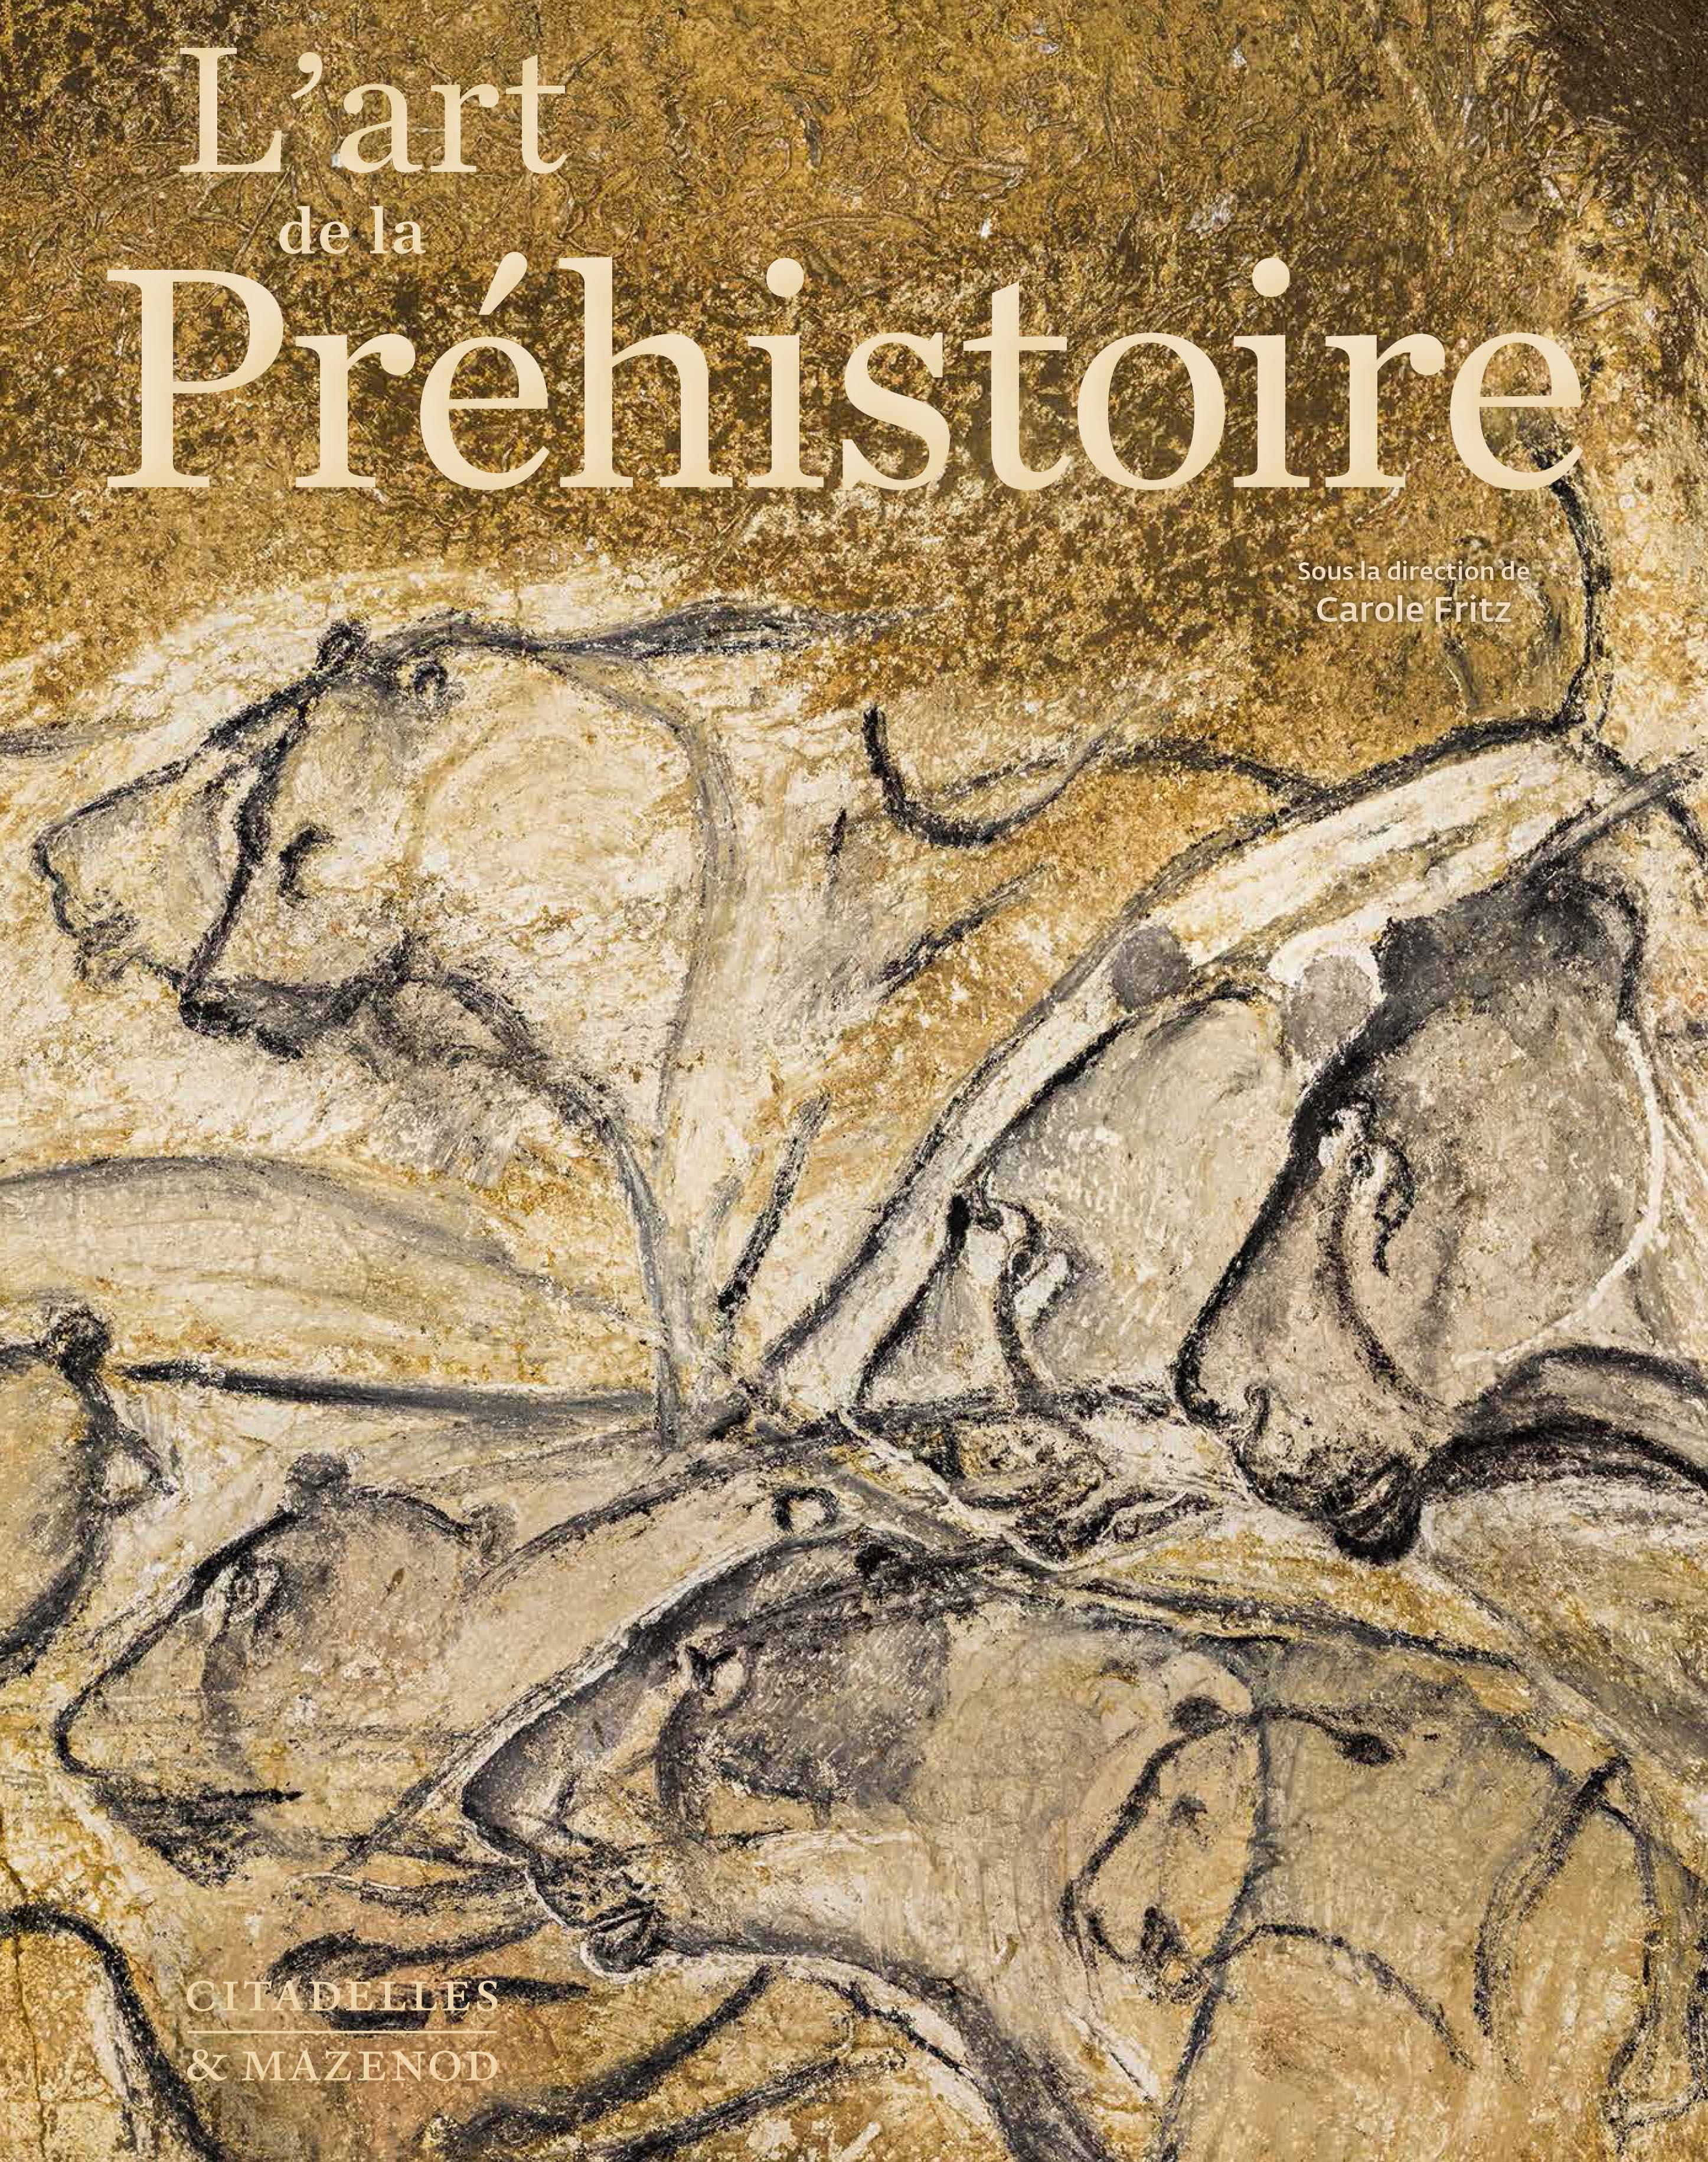 Art de la Prehistoire-Citadelles et Mazenod-couv.jpg